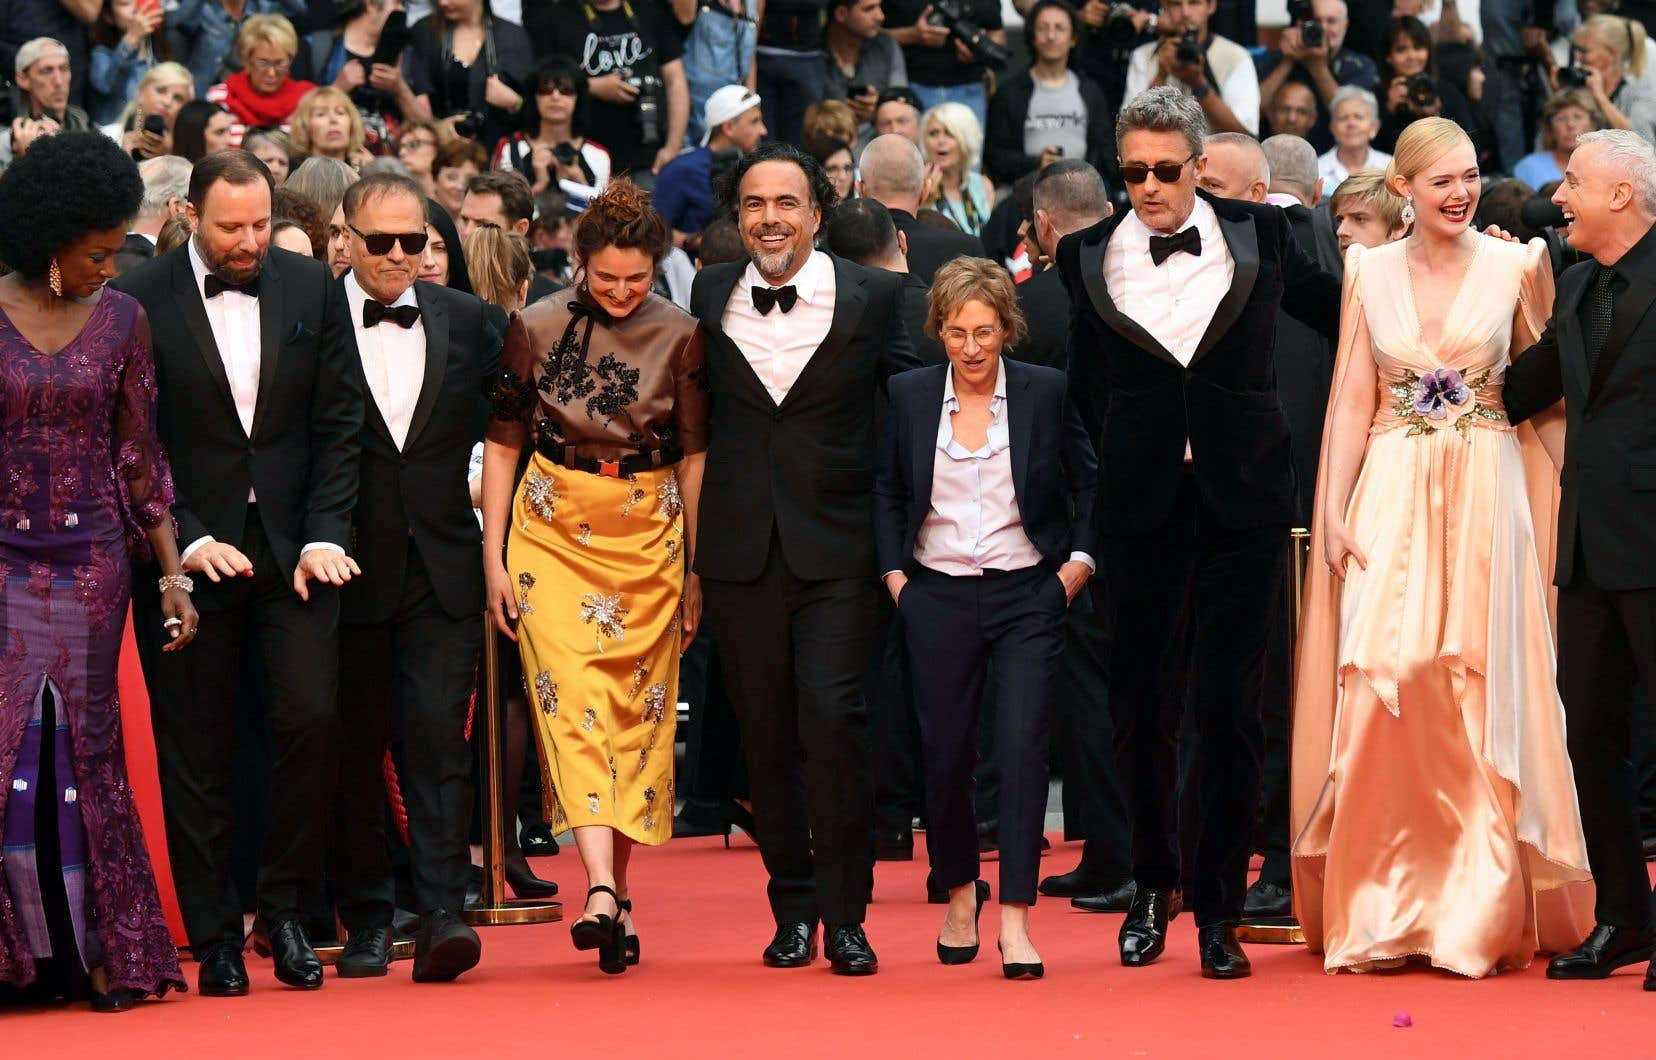 Le jury, de gauche à droite: Maïmouna N'Diaye, Yorgos Lanthimos, Enki Bilal, Alice Rohrwacher, Alejandro González Iñárritu, Kelly Reichardt, Pavel Pawlikowski, Elle Fanning et Robin Campillo